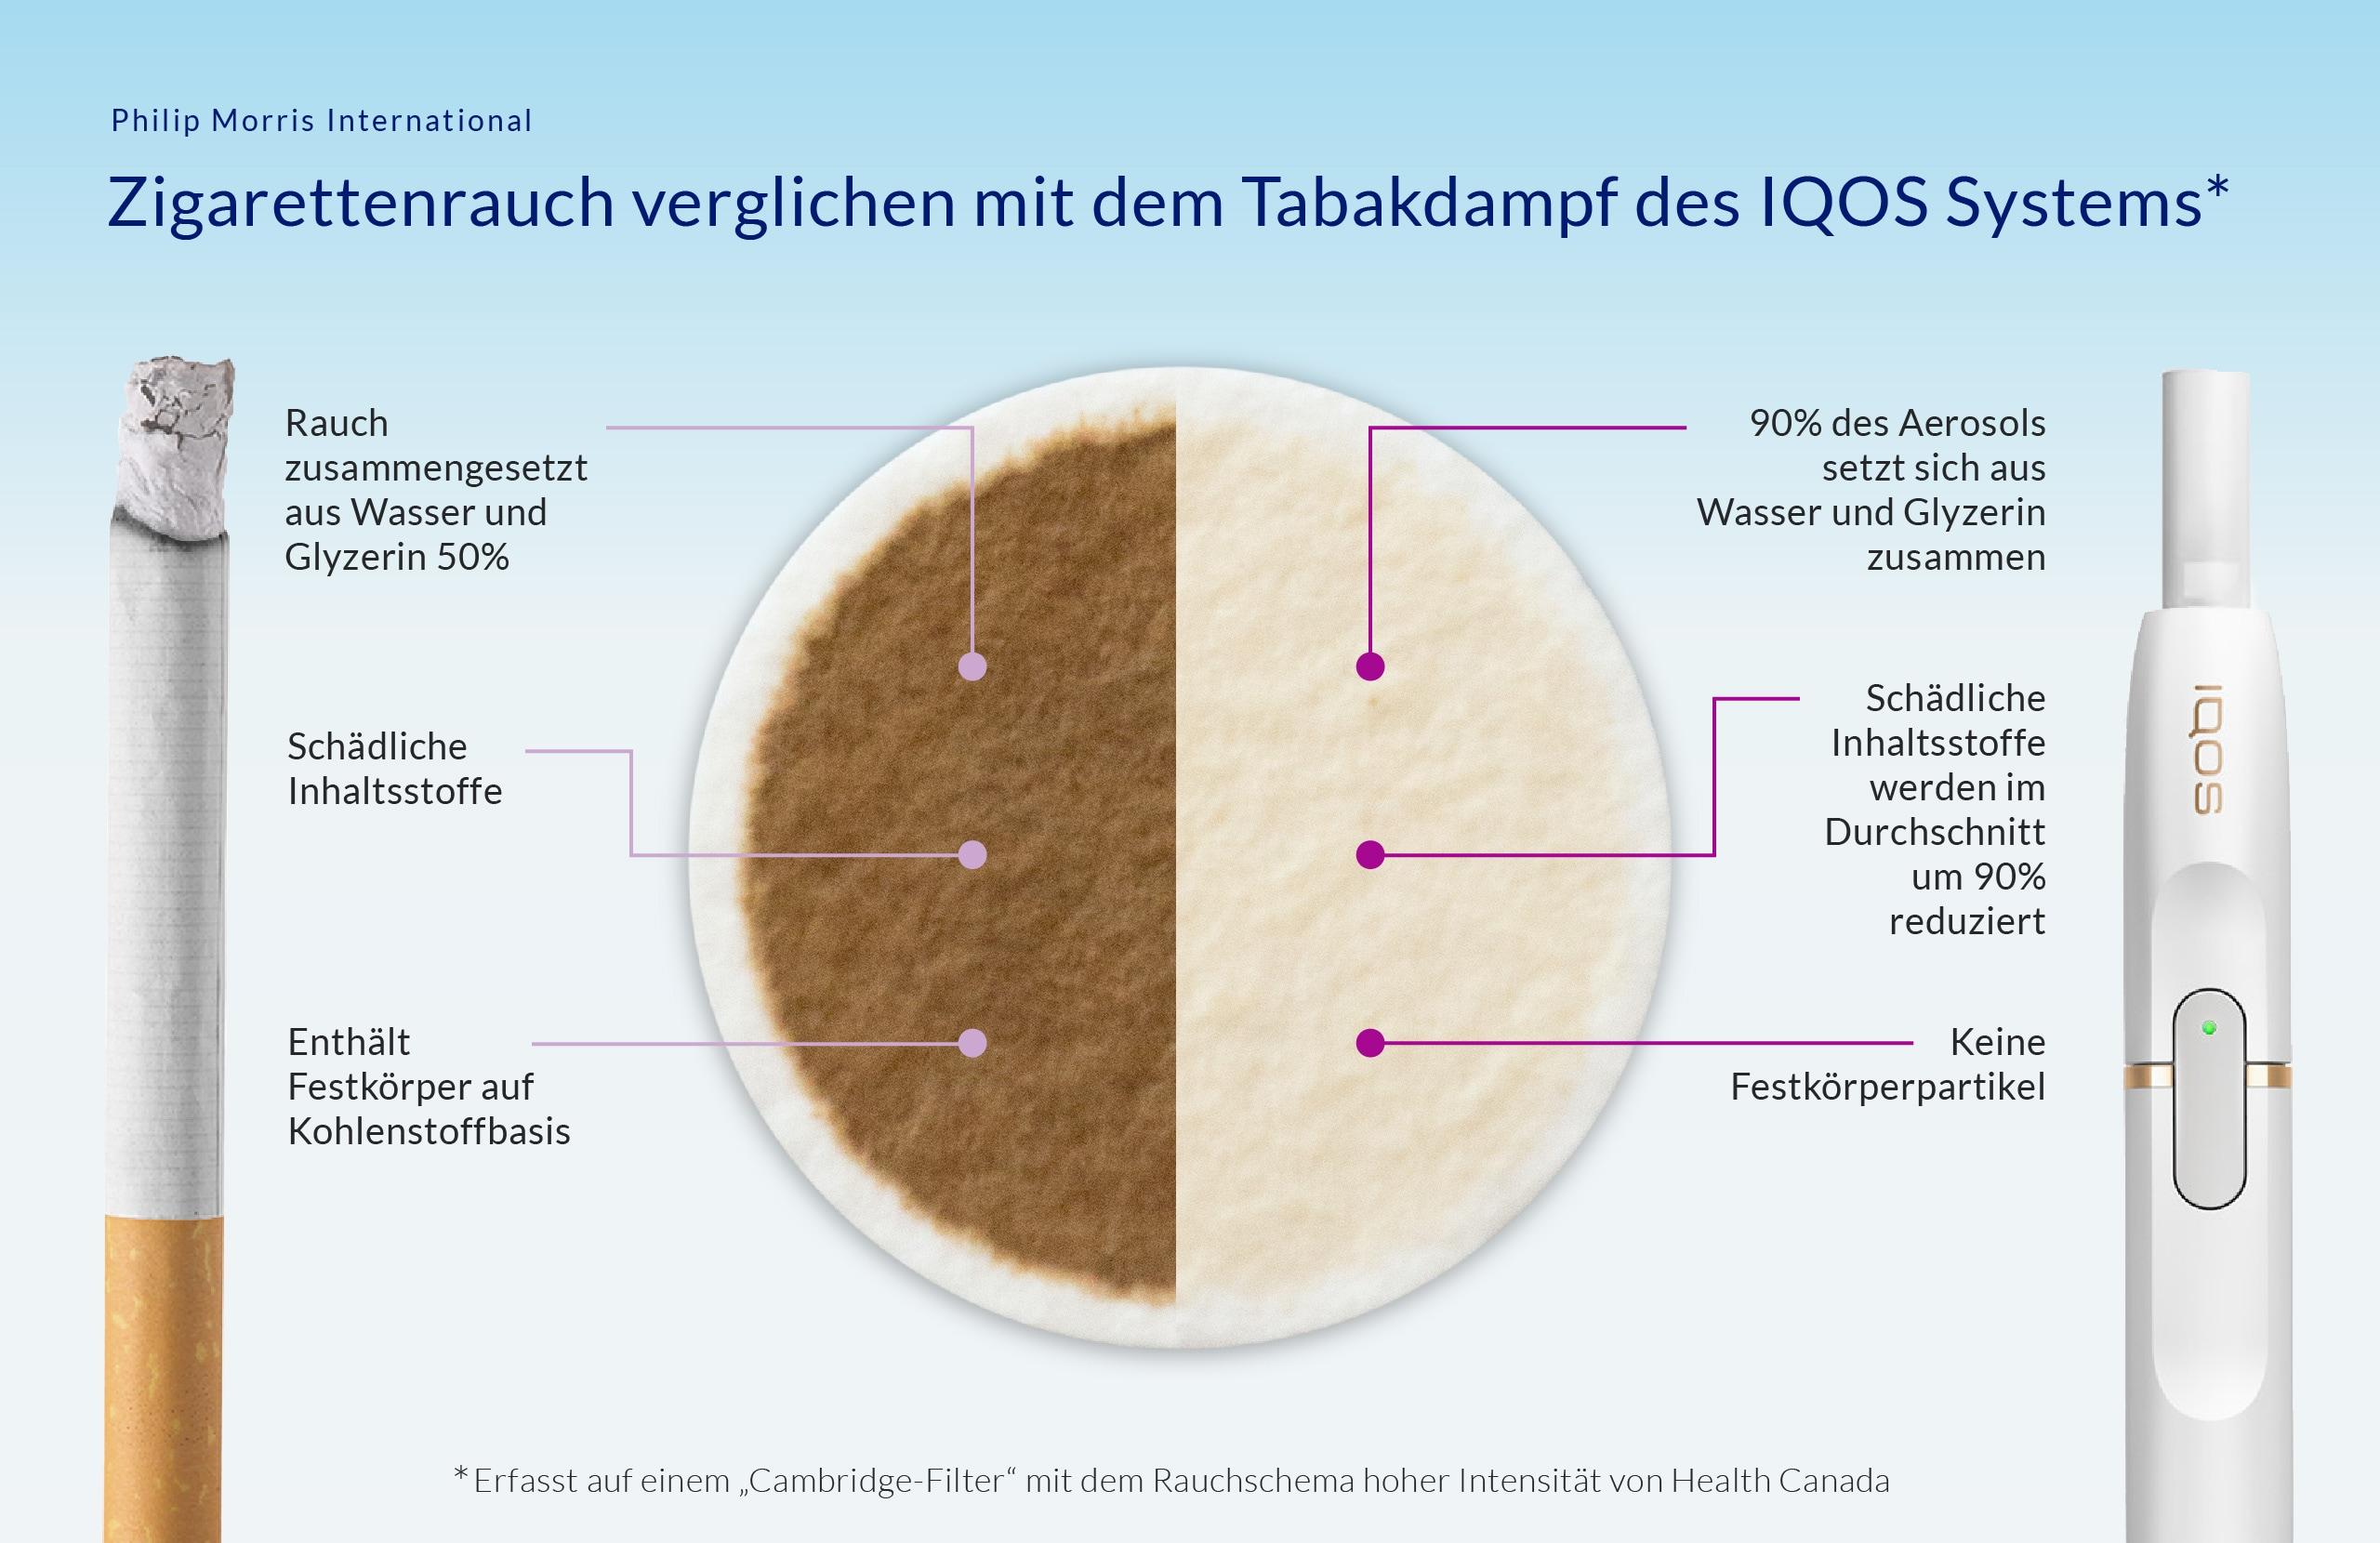 PMI-IG-Cig-Iqos-German